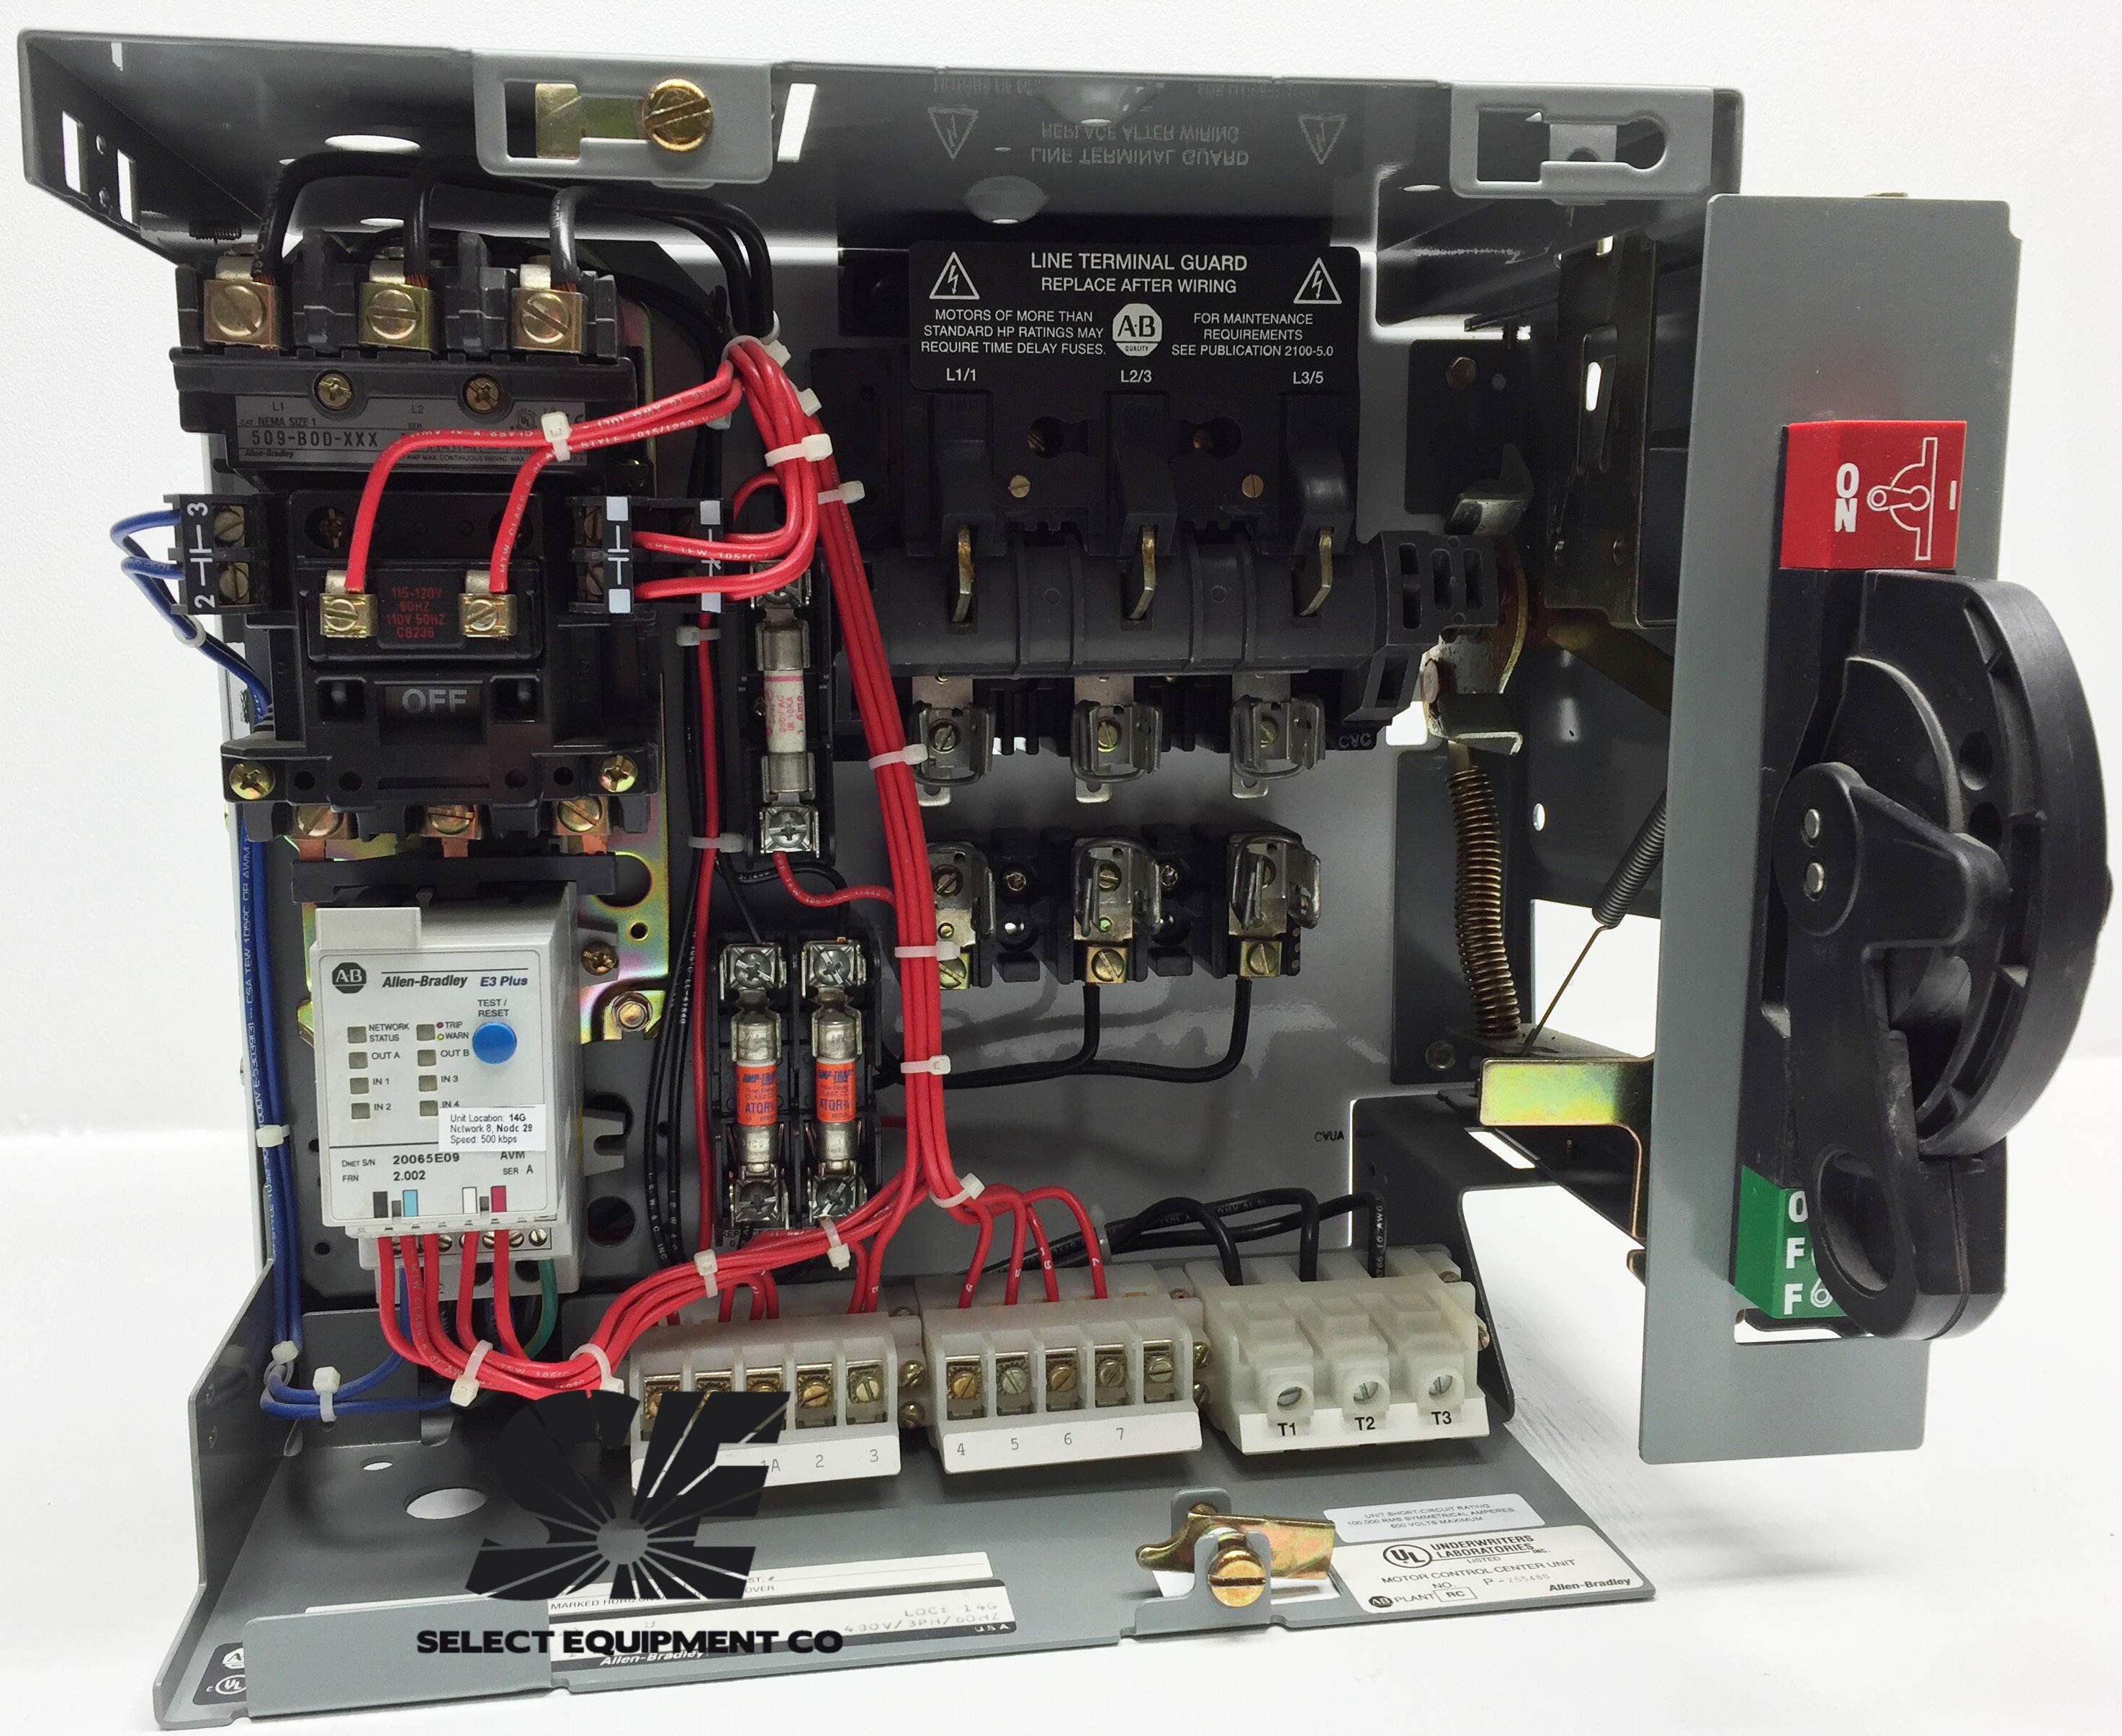 193 ec1cb allen bradley e3 overload relay select for Allen bradley motor overload